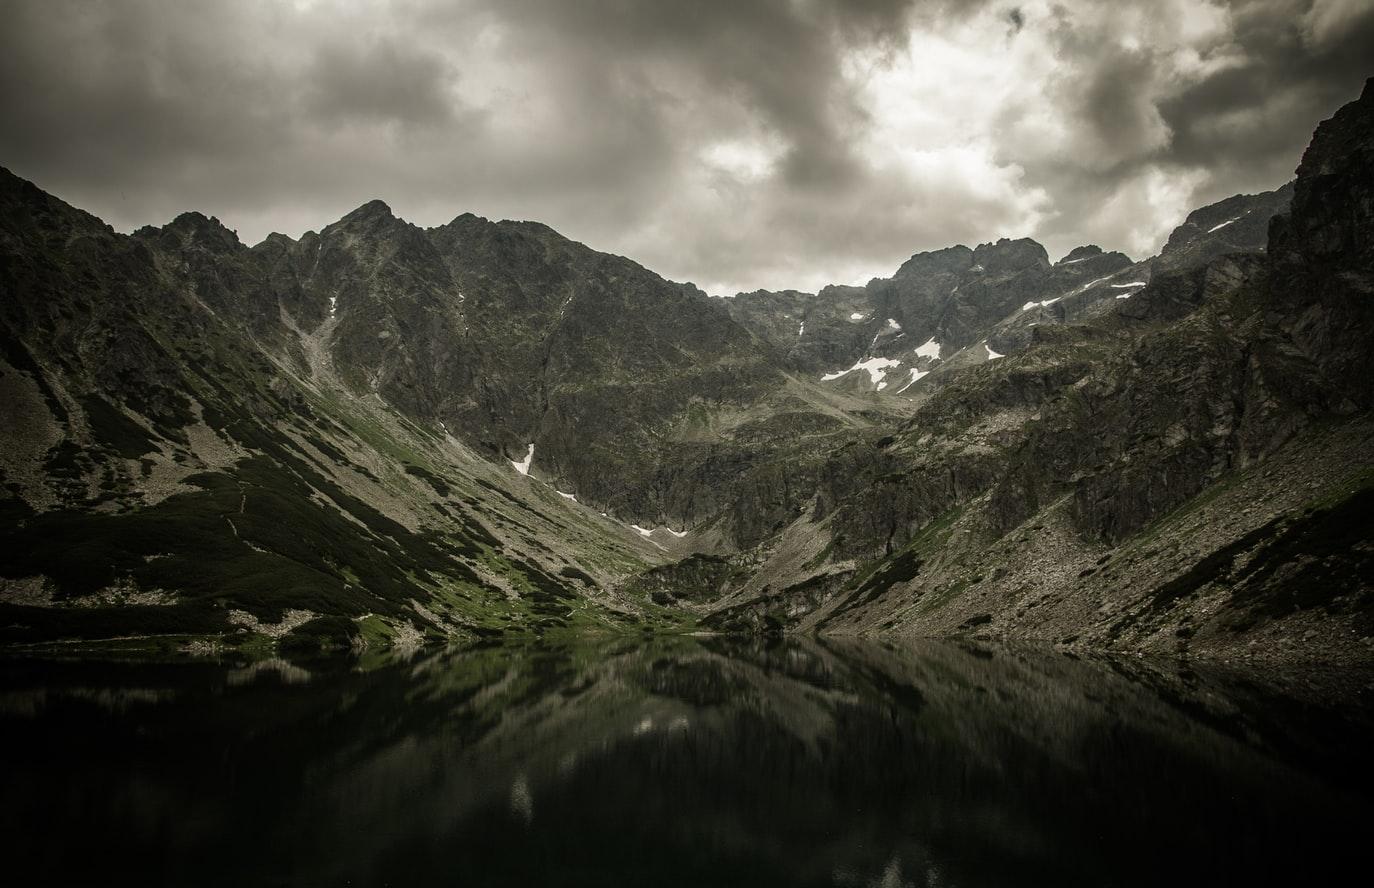 Gloomy Image of Mountain Range with peaks and valleys